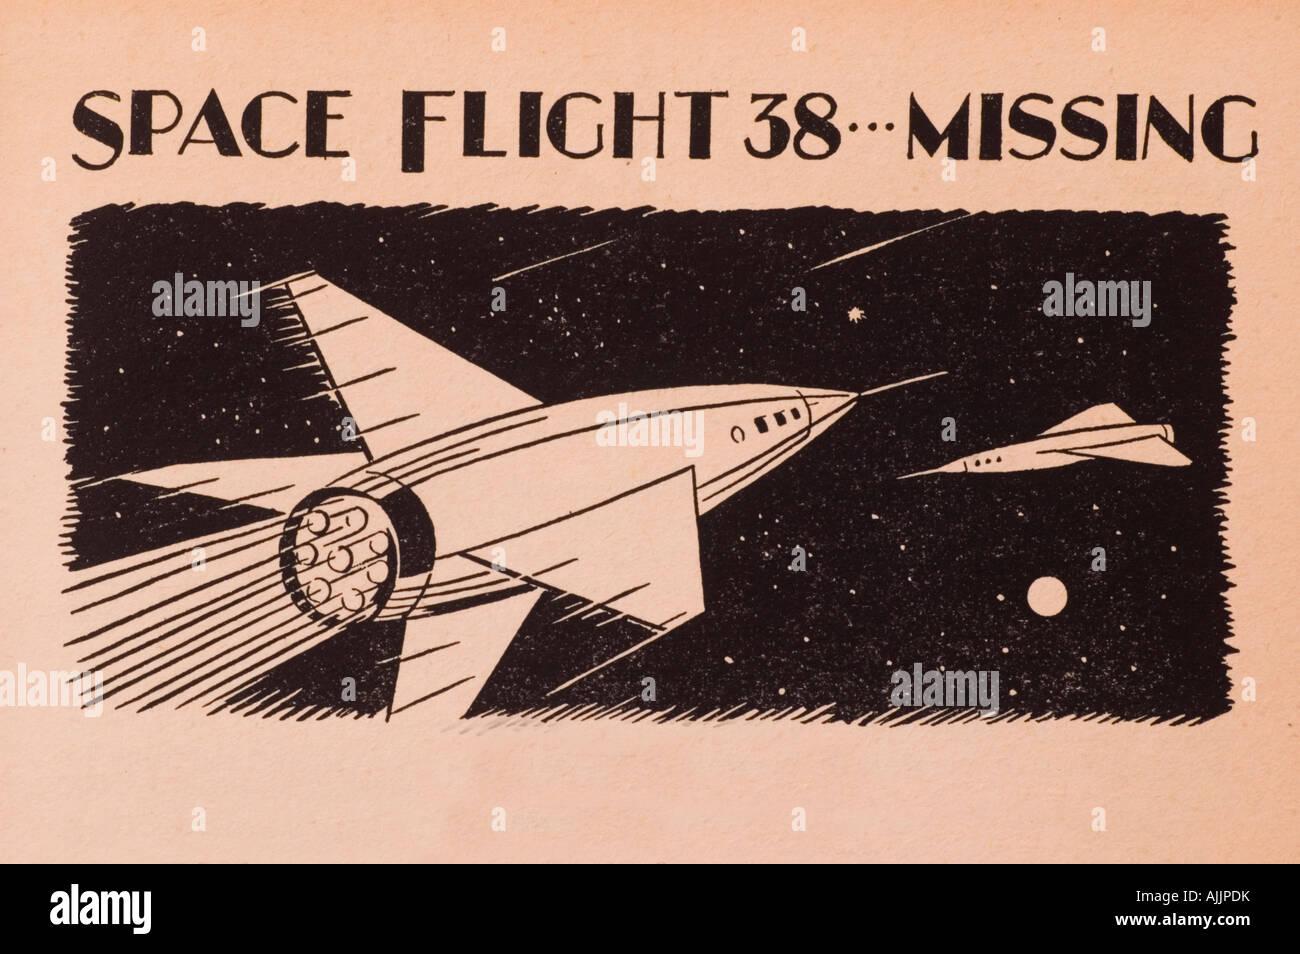 Space flight 38 is missing 1950 cartoon book - Stock Image